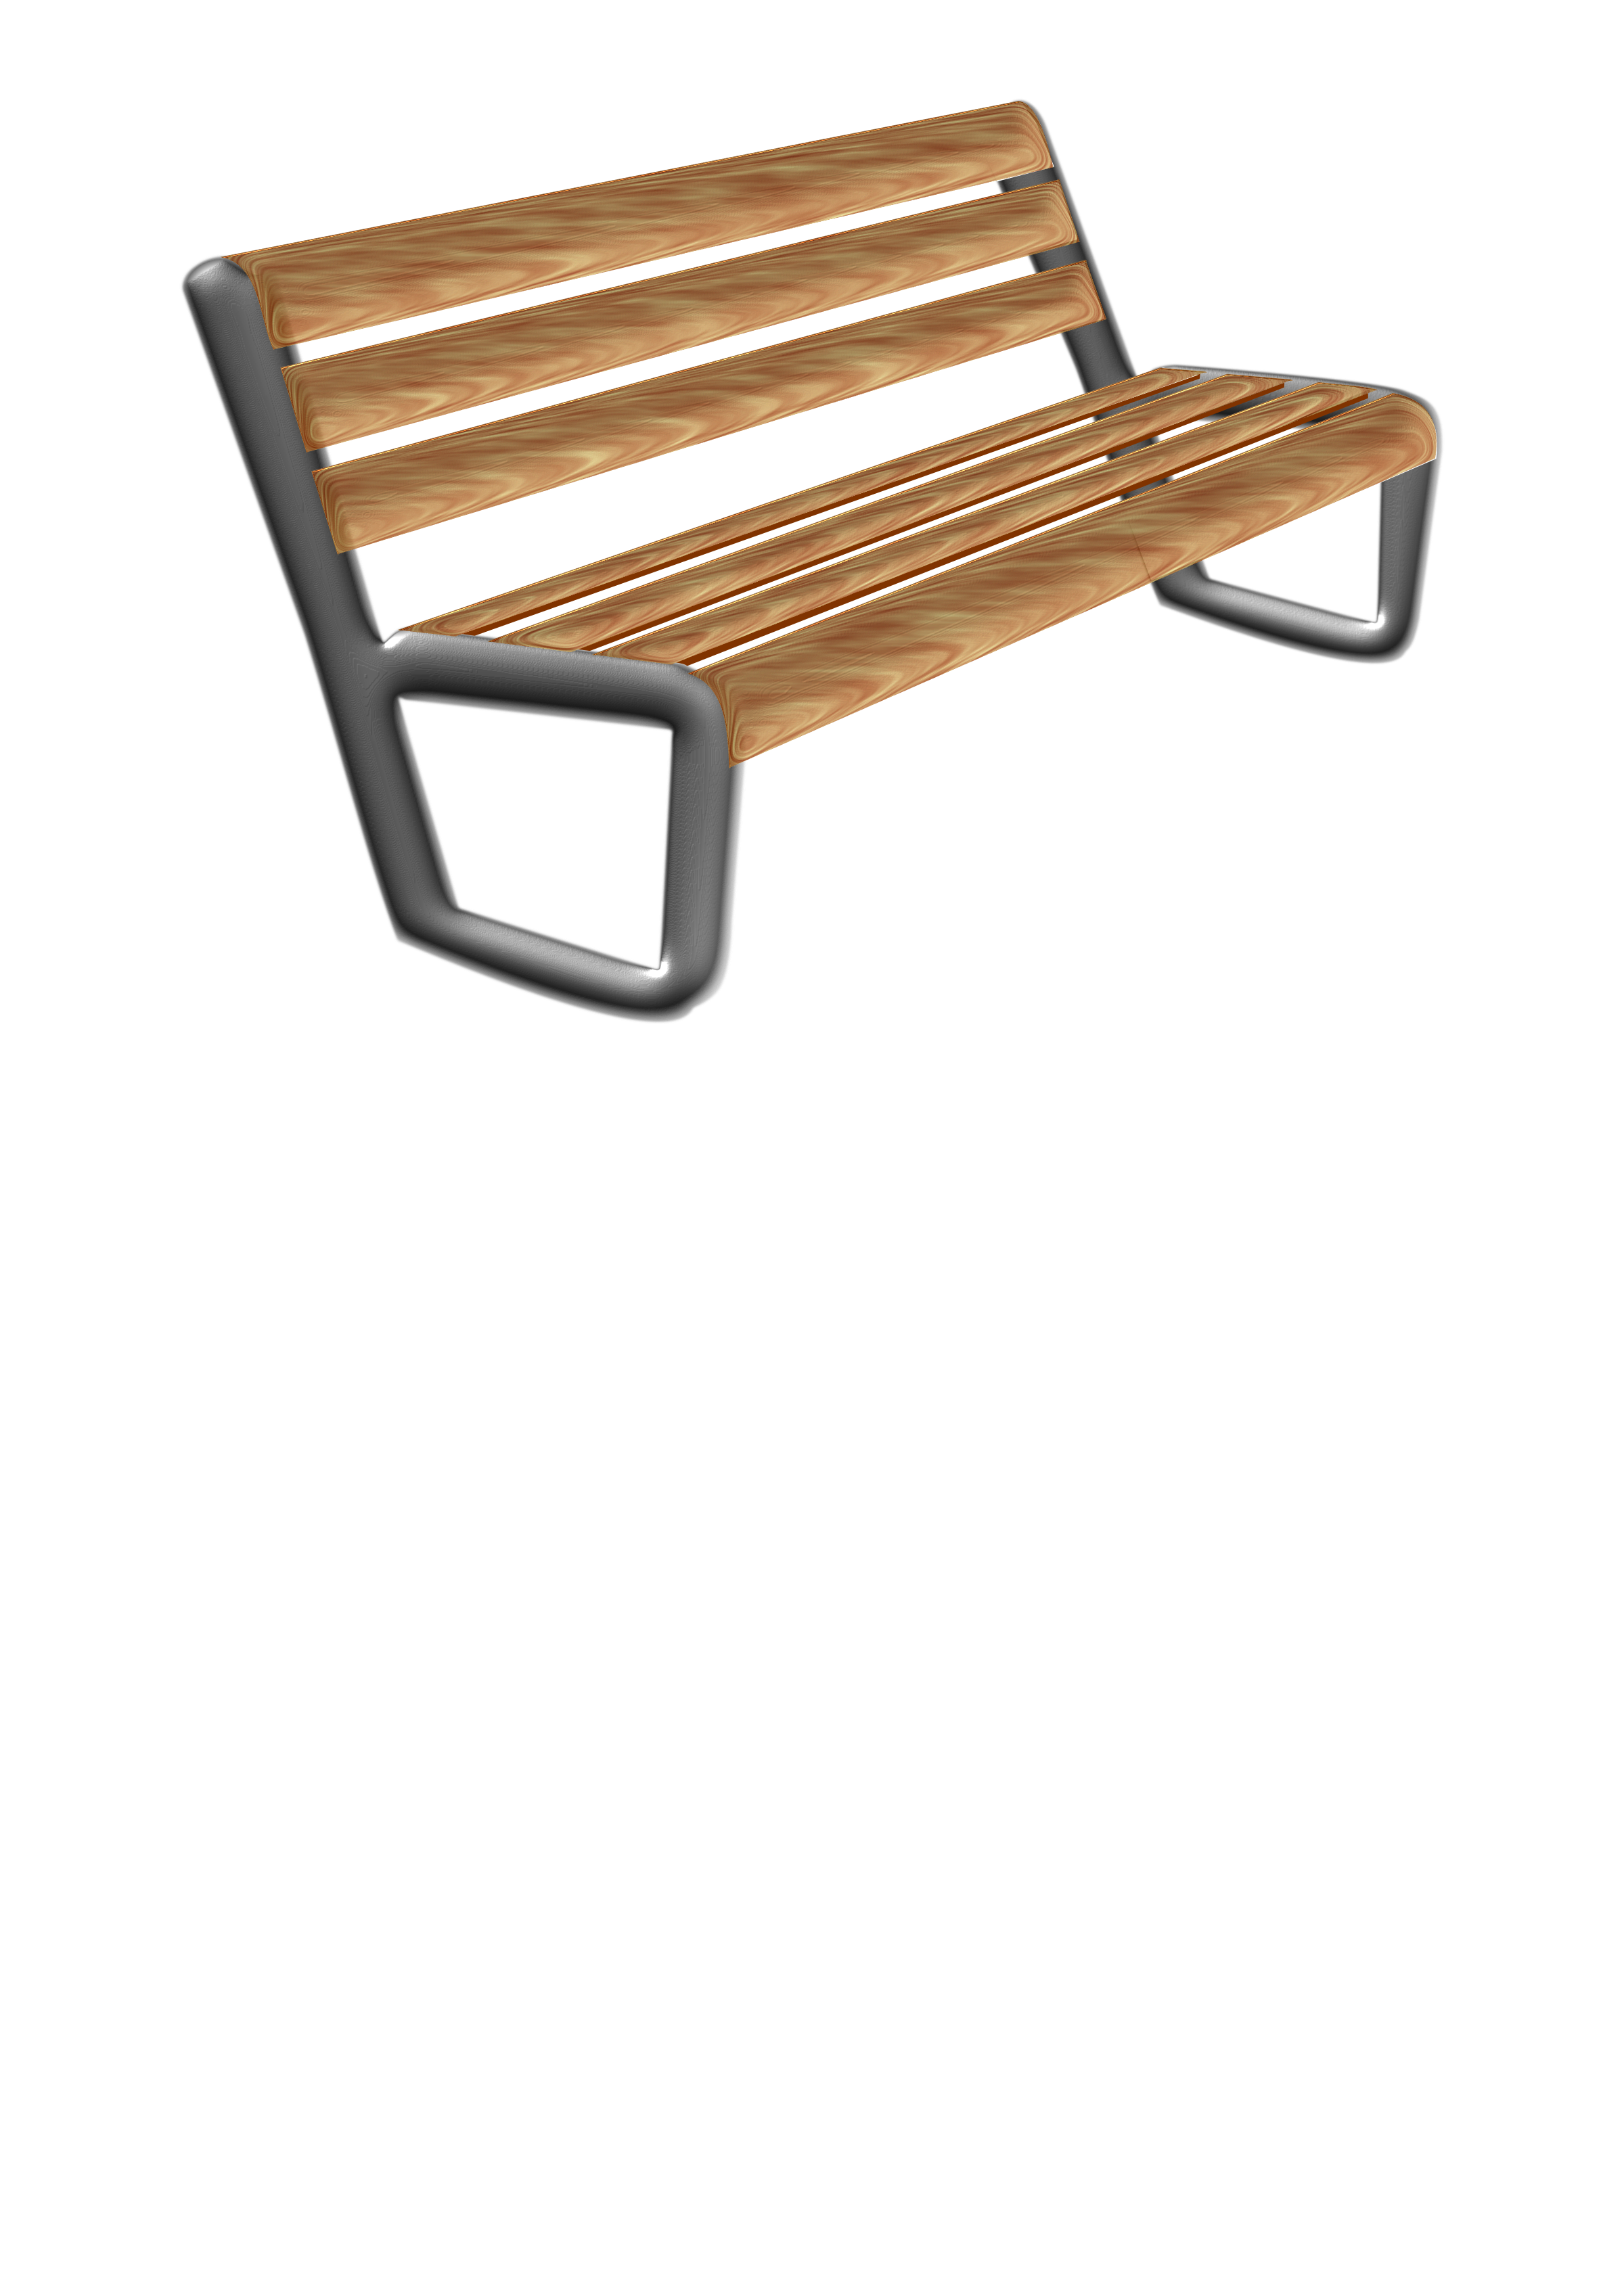 Bench clipart modern. Banco moderno big image